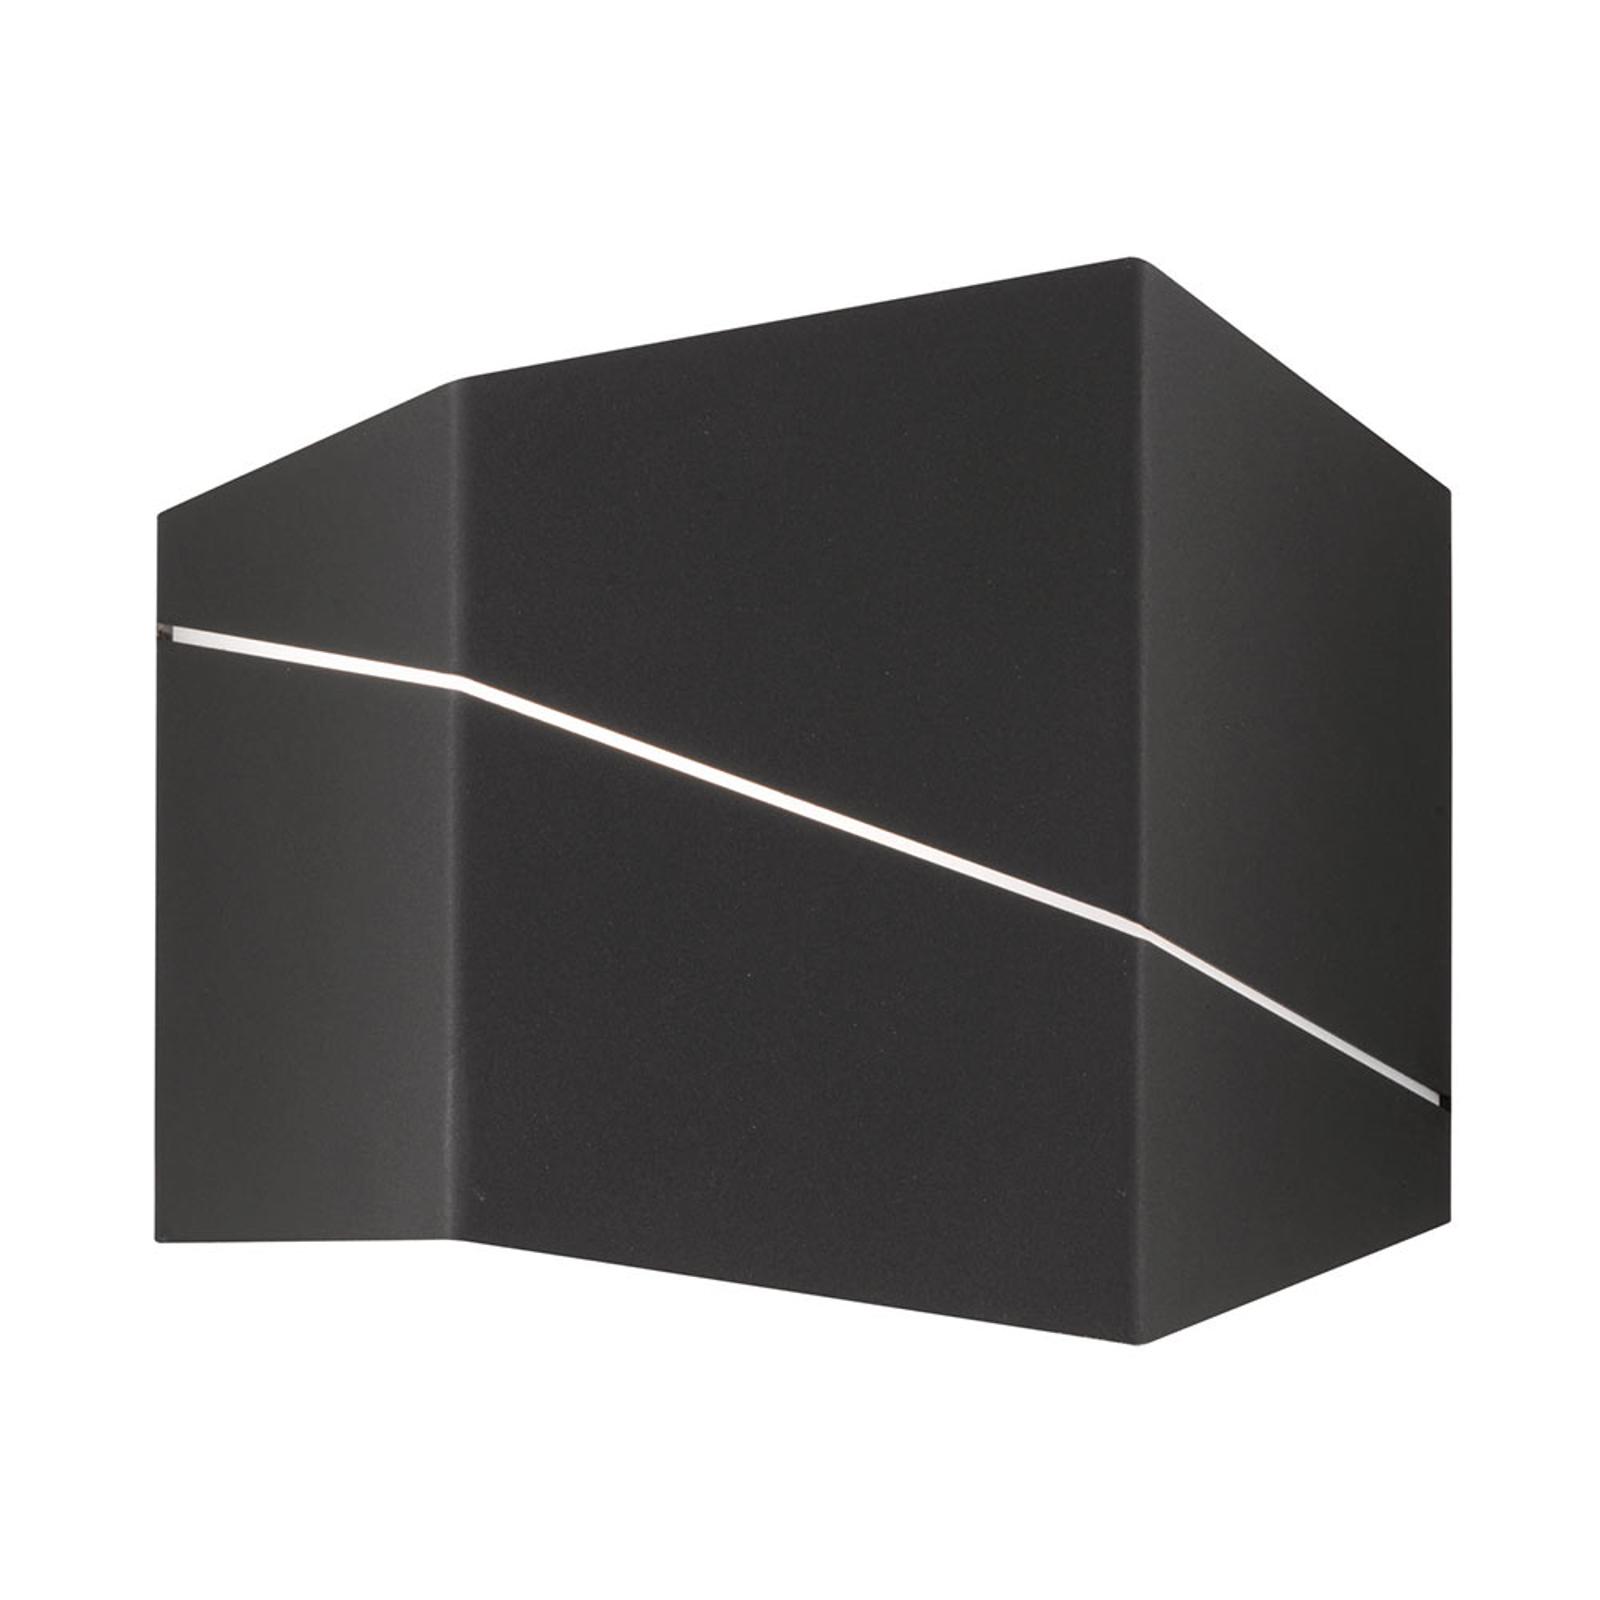 Zorro - moderne LED wandlamp, zwart mat, 18 cm